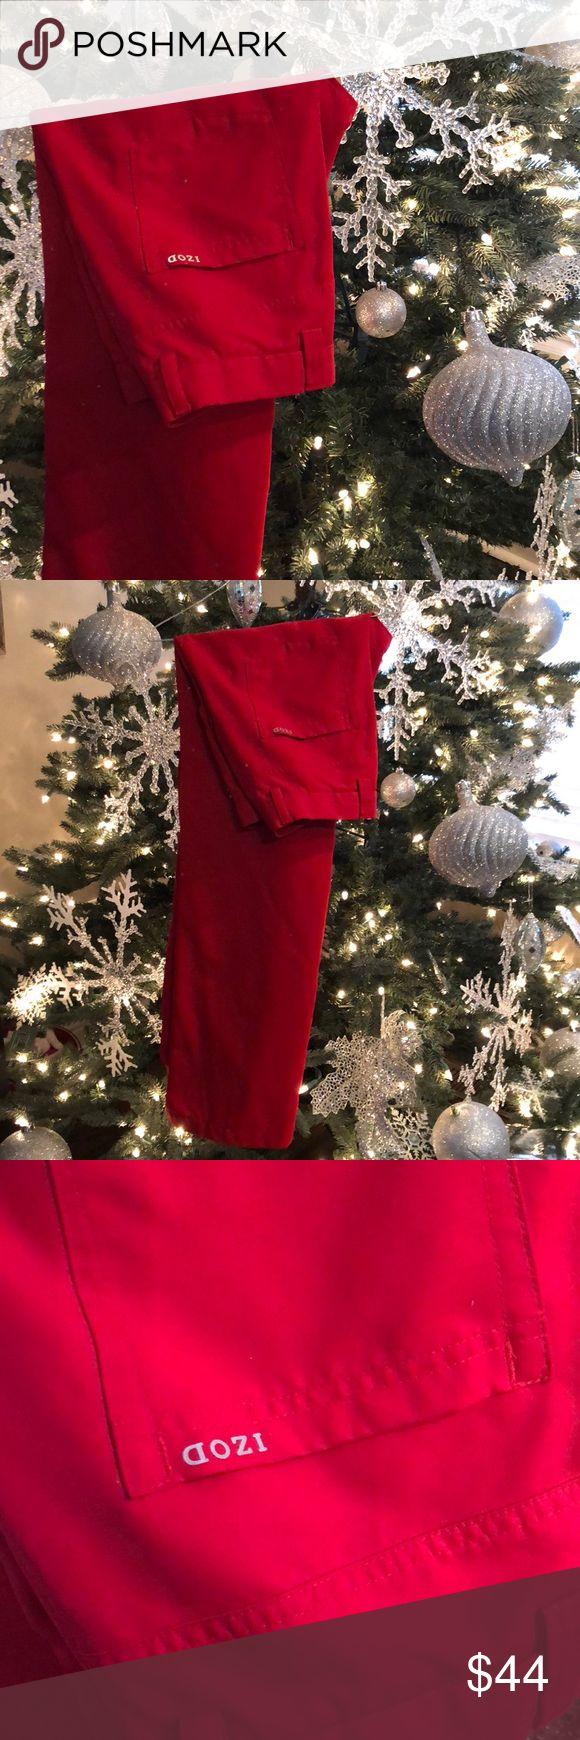 🎅🏻🎄IZOD Christmas red golf pants Sz:32x32🎄🎅🏻 Perfect, like new condition! Size 32x32 red IZOD golf pants perfect for the holidays! Bundle & save!!! 🎄🎅🏻🎁❤️ Izod Pants Dress